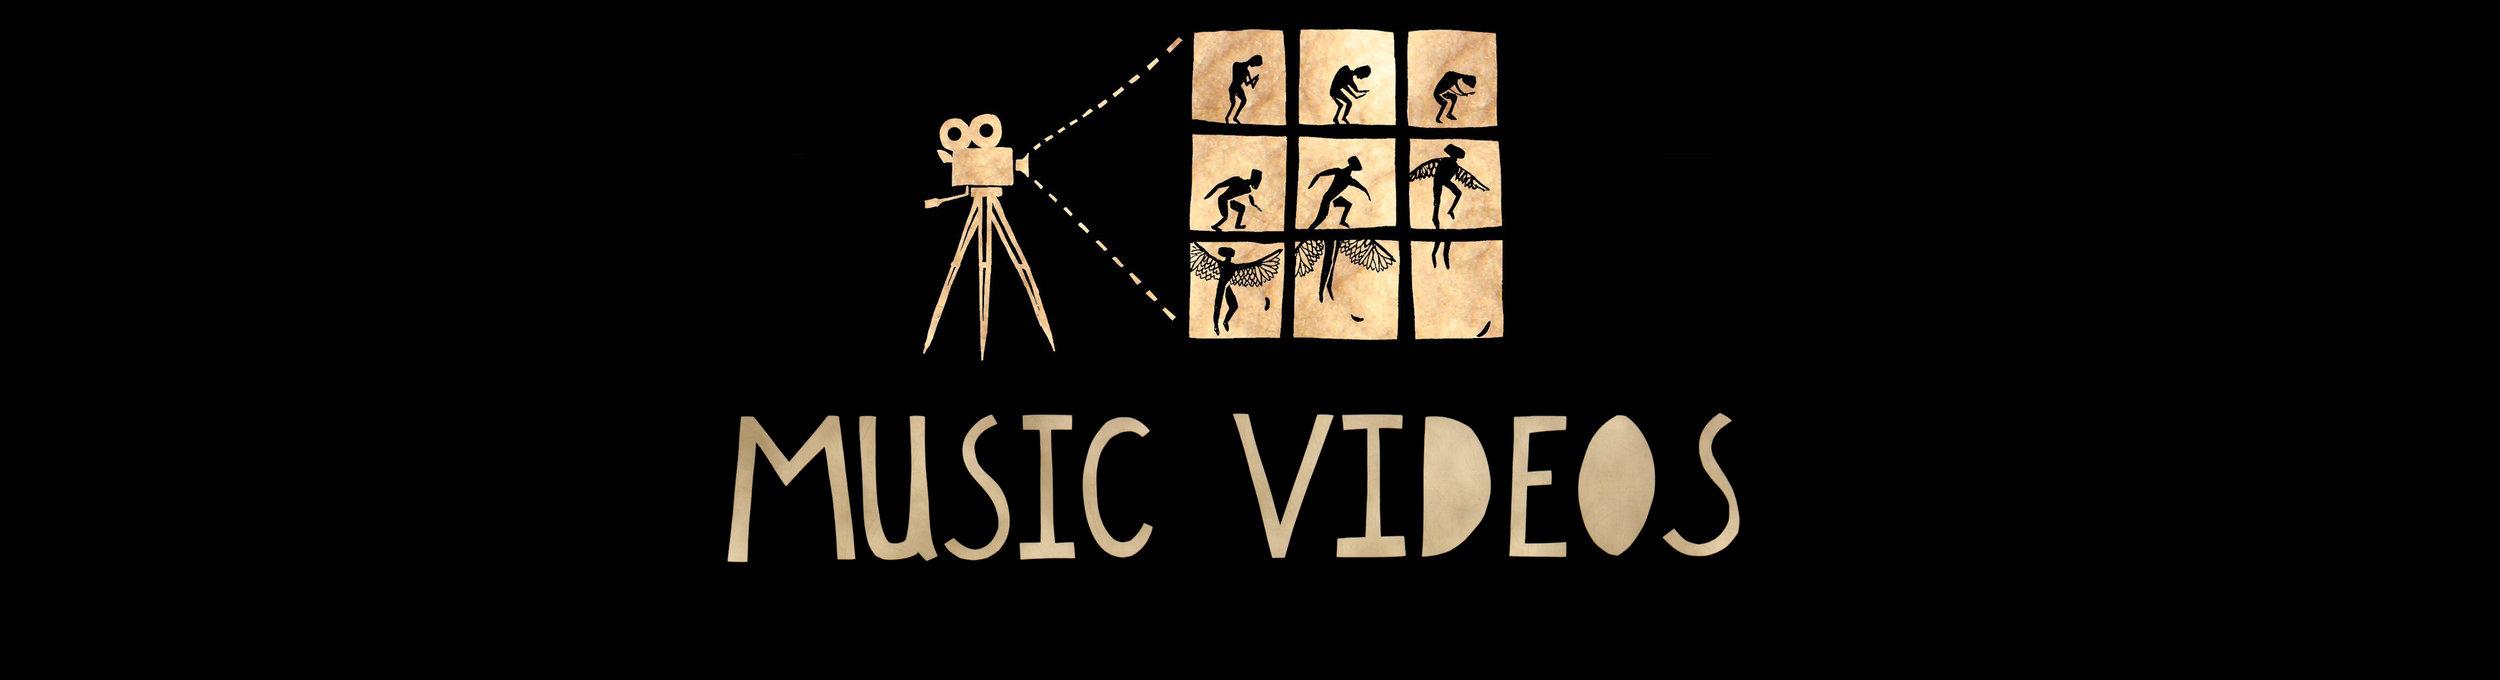 music video logo big.jpg